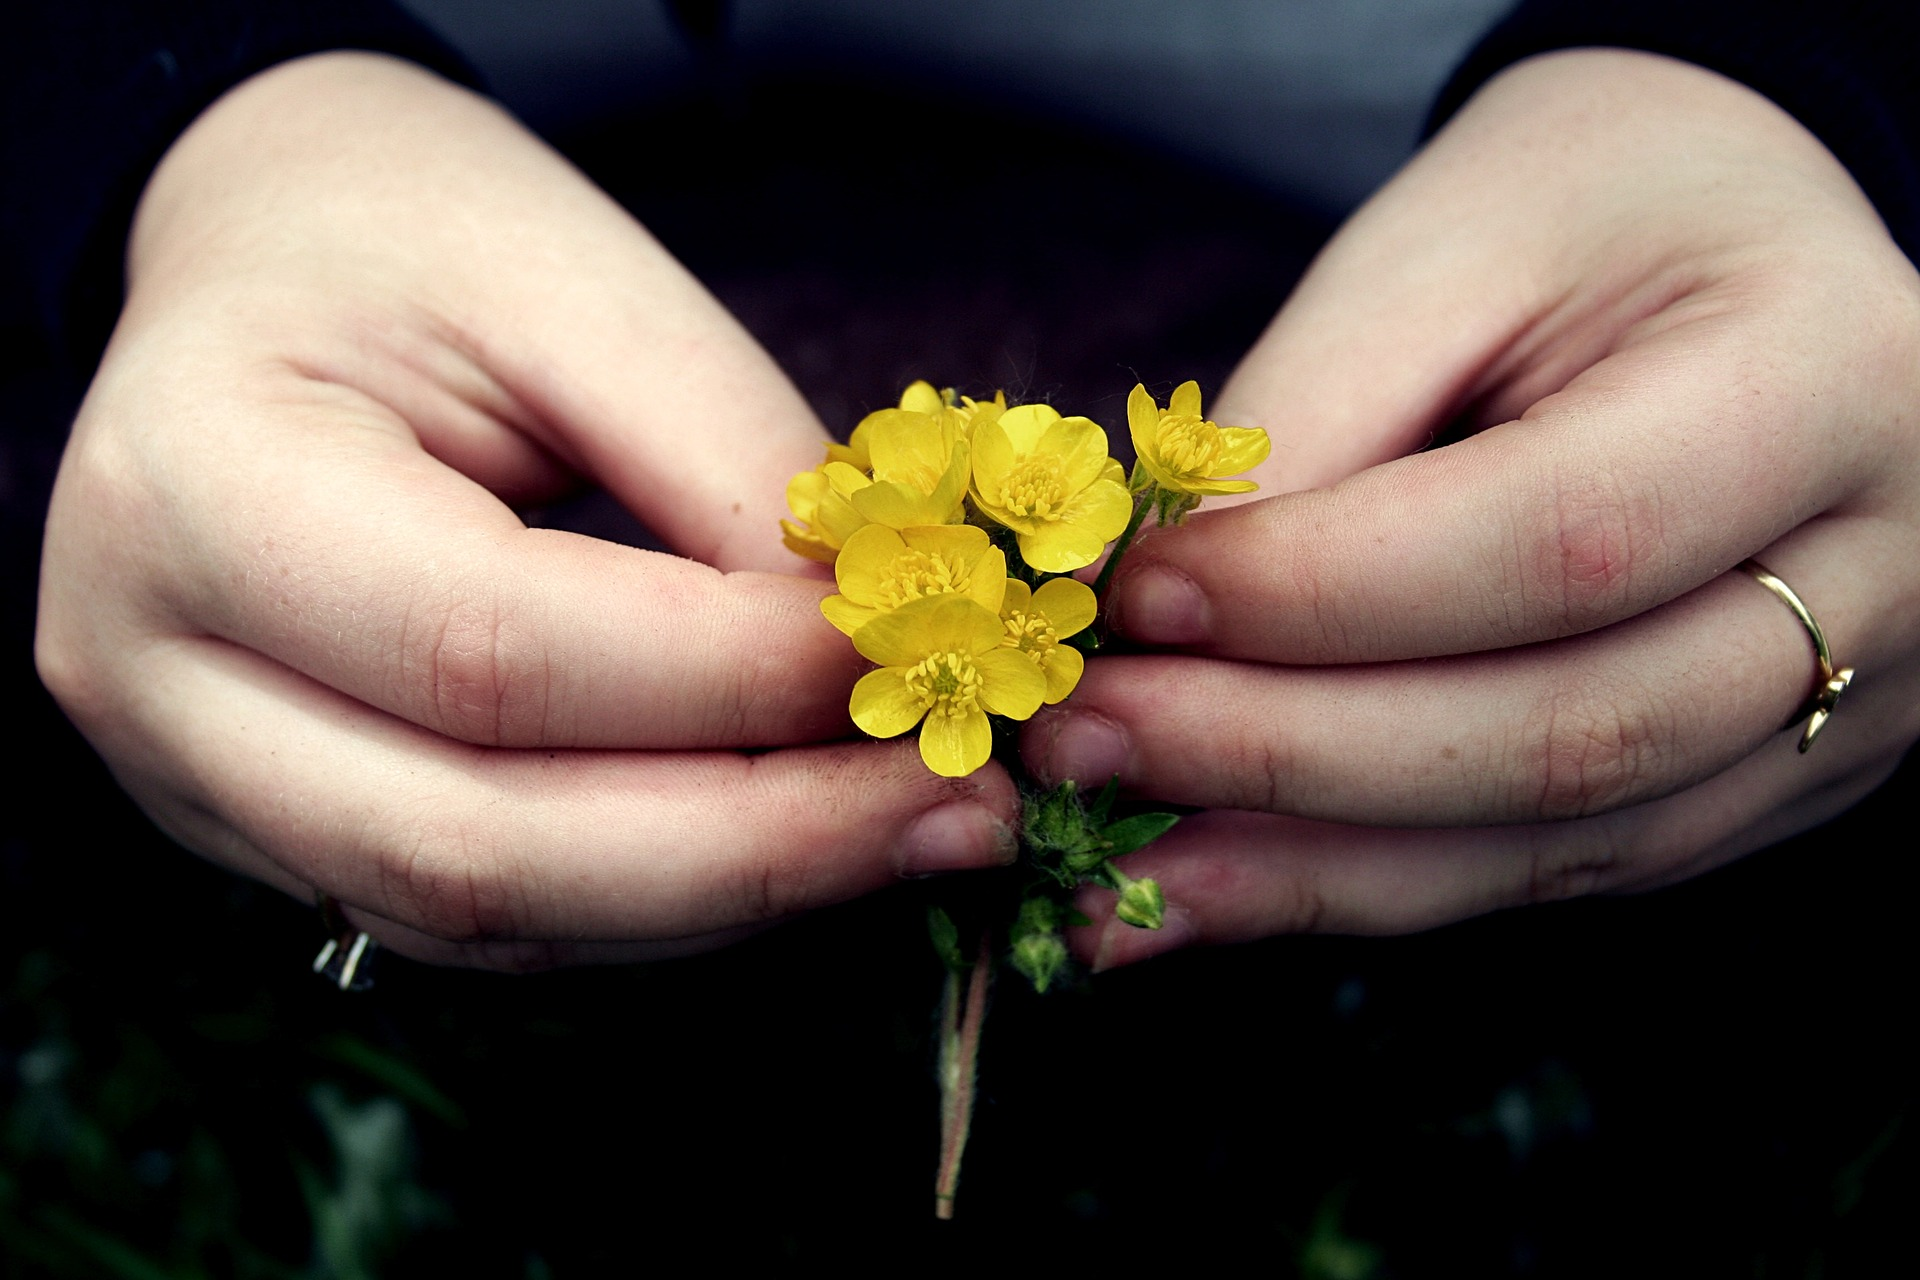 Hands yellow flower